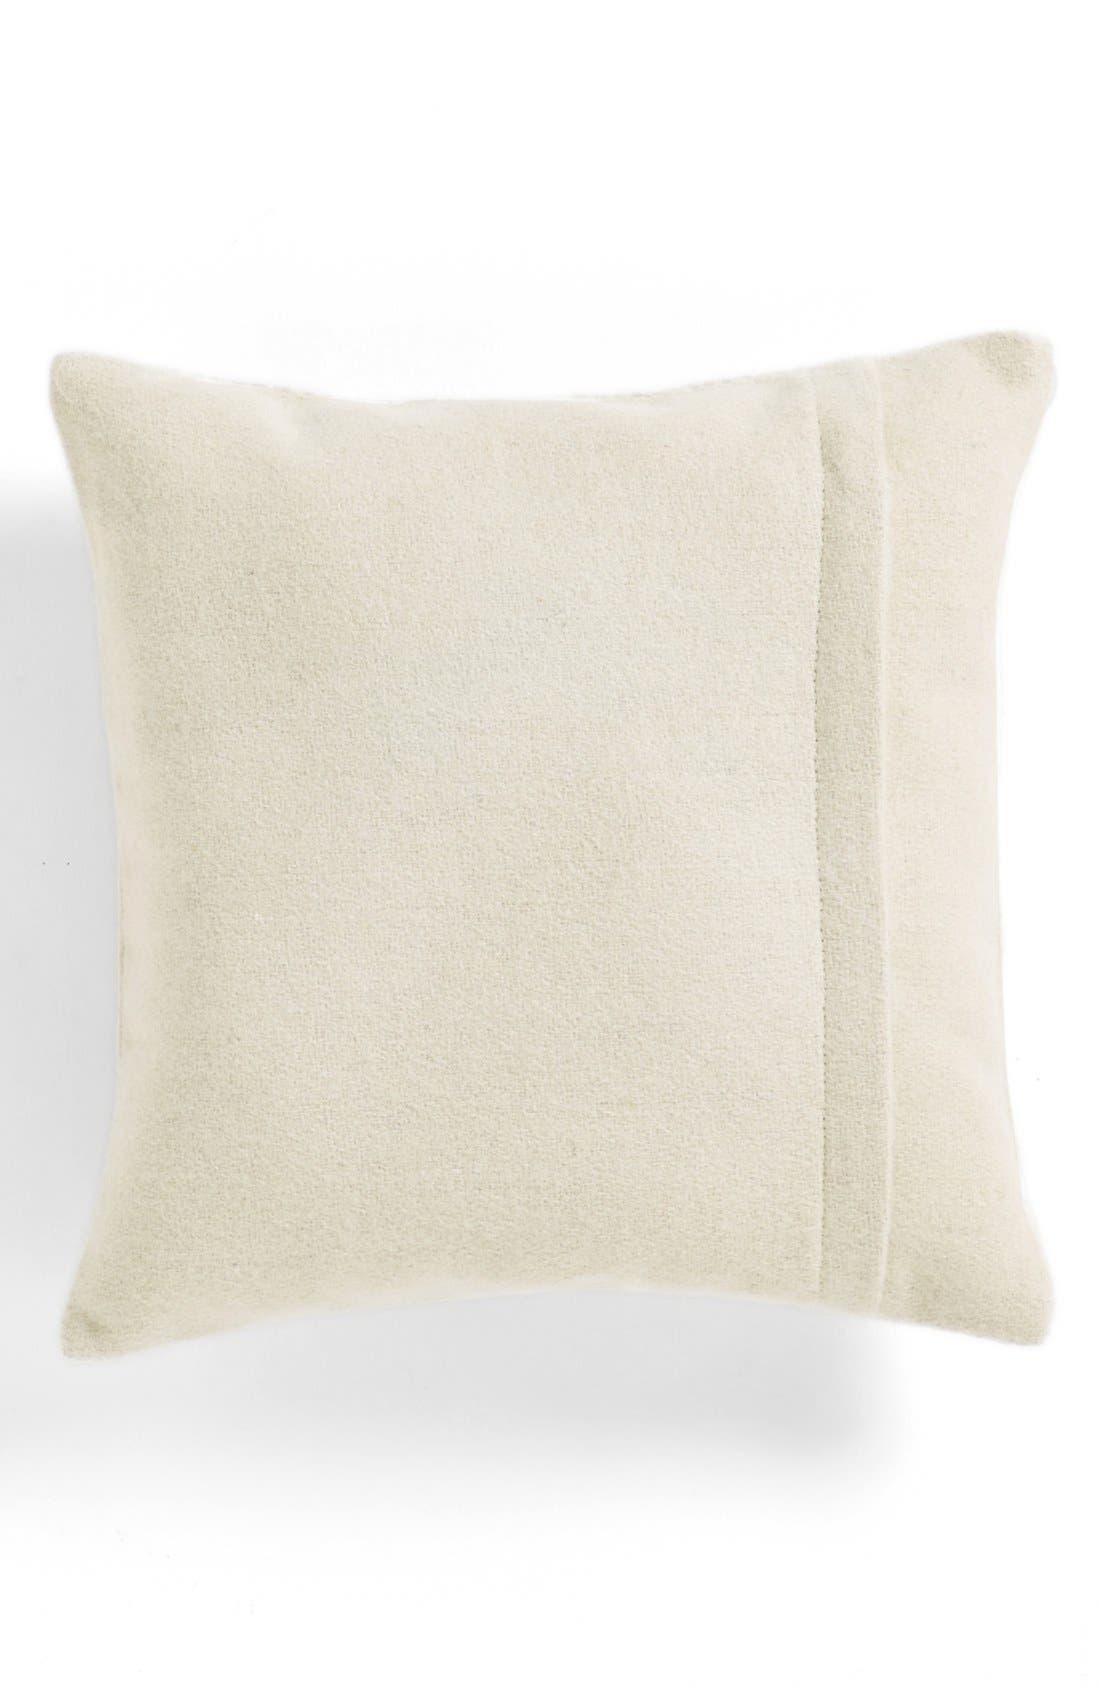 Alternate Image 2  - Amity Home 'Owl' Decorative Pillow